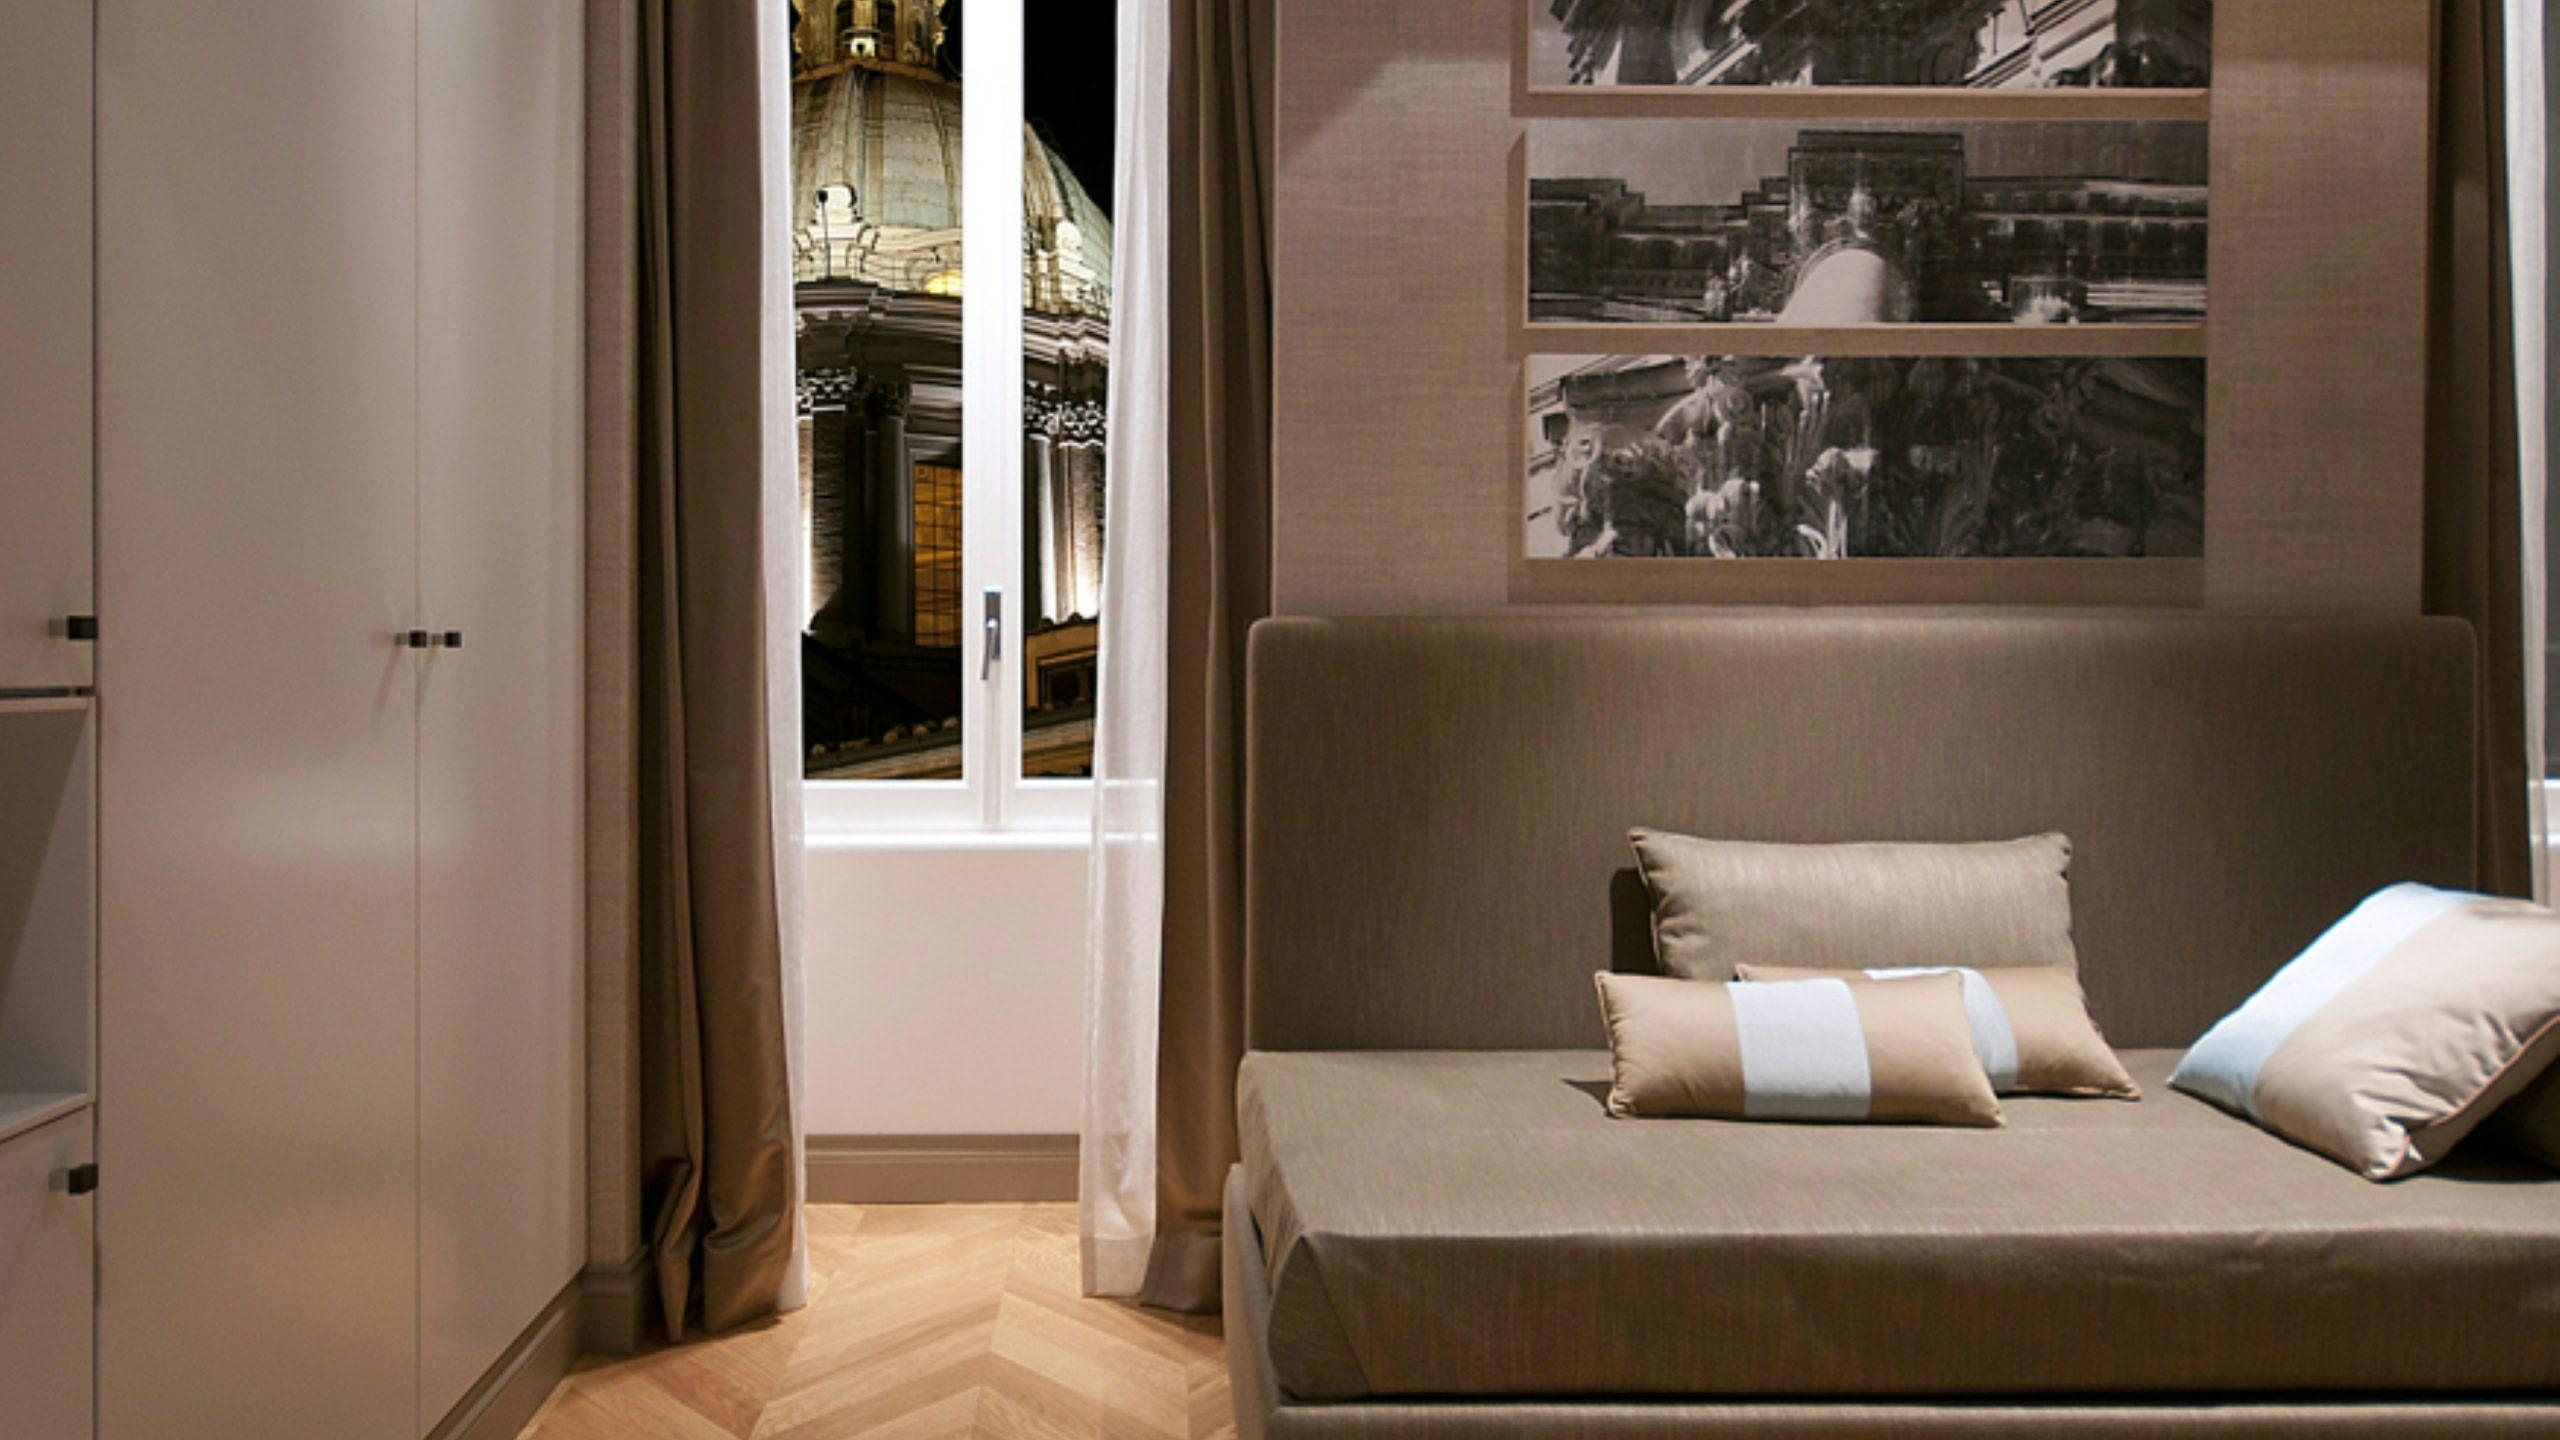 San-Carlo-Suite-Rome-deluxe-suite-4